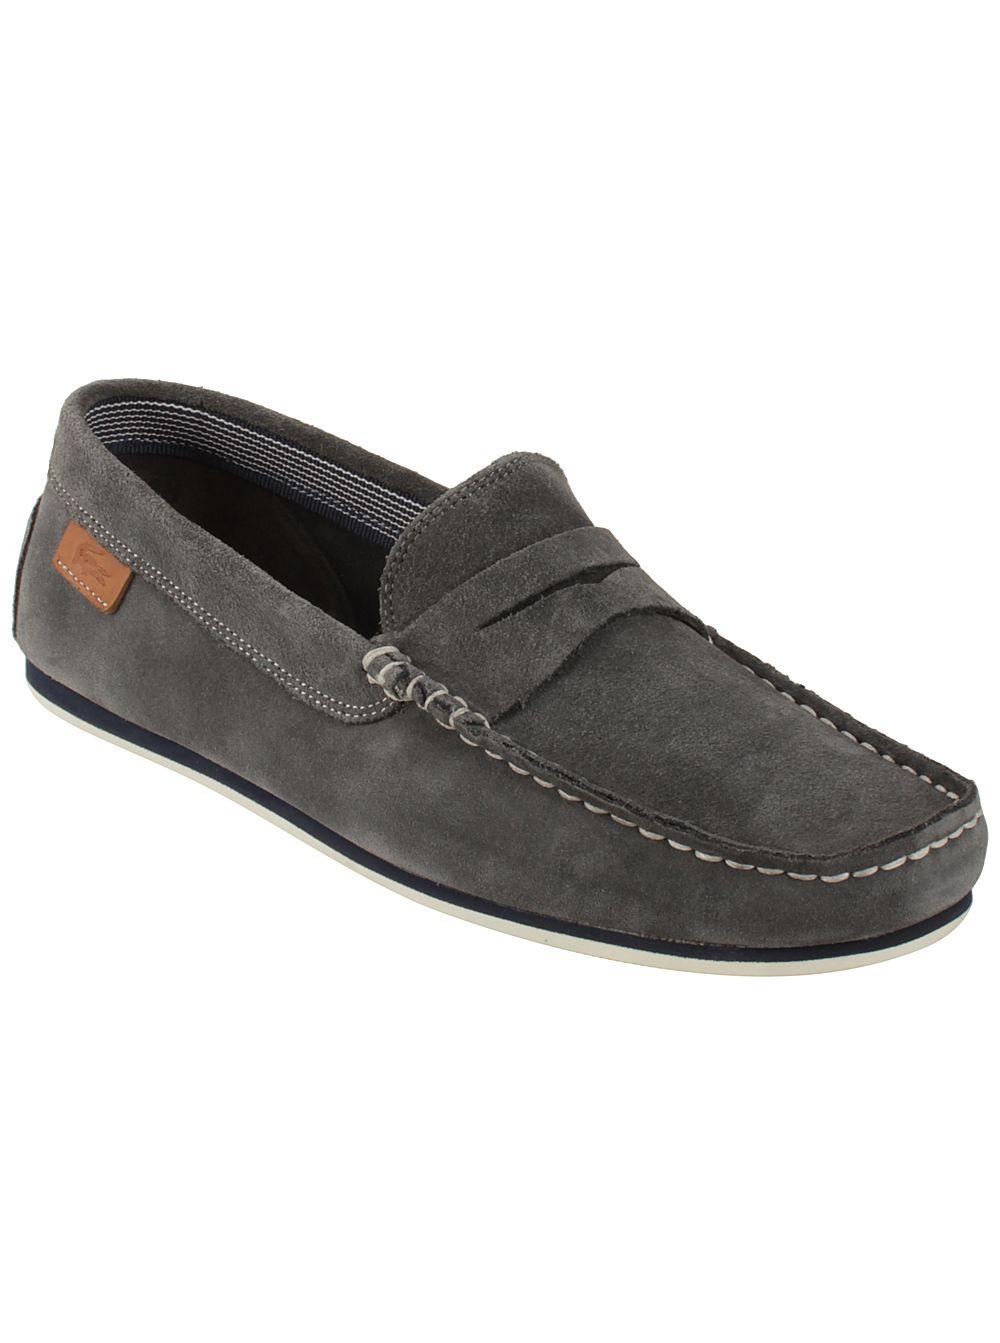 najwyższa jakość kup sprzedaż taniej Lacoste Men's Chanler in grey. | Lacoste men, Mens fashion ...